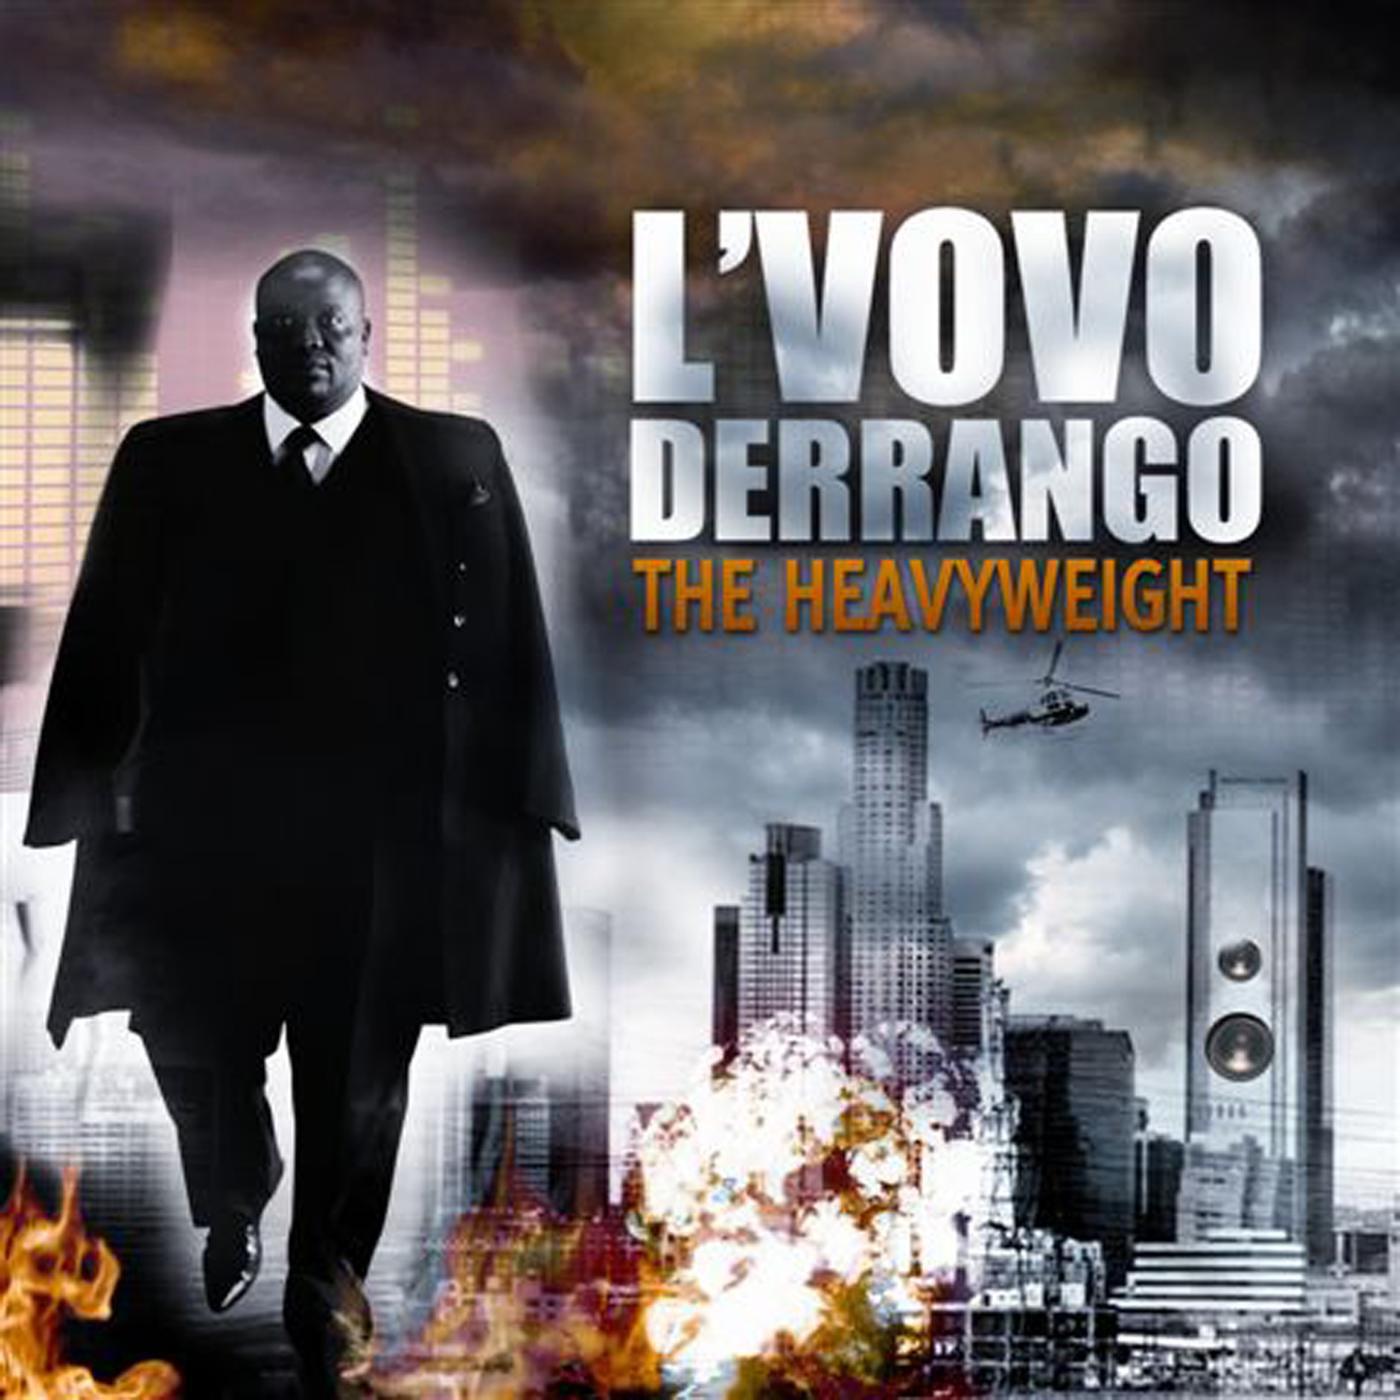 2008 L'vovo Derrango - Thokozani Ndlovu - Sangoma - South African Kwaito Star - Album - The Heavyweight